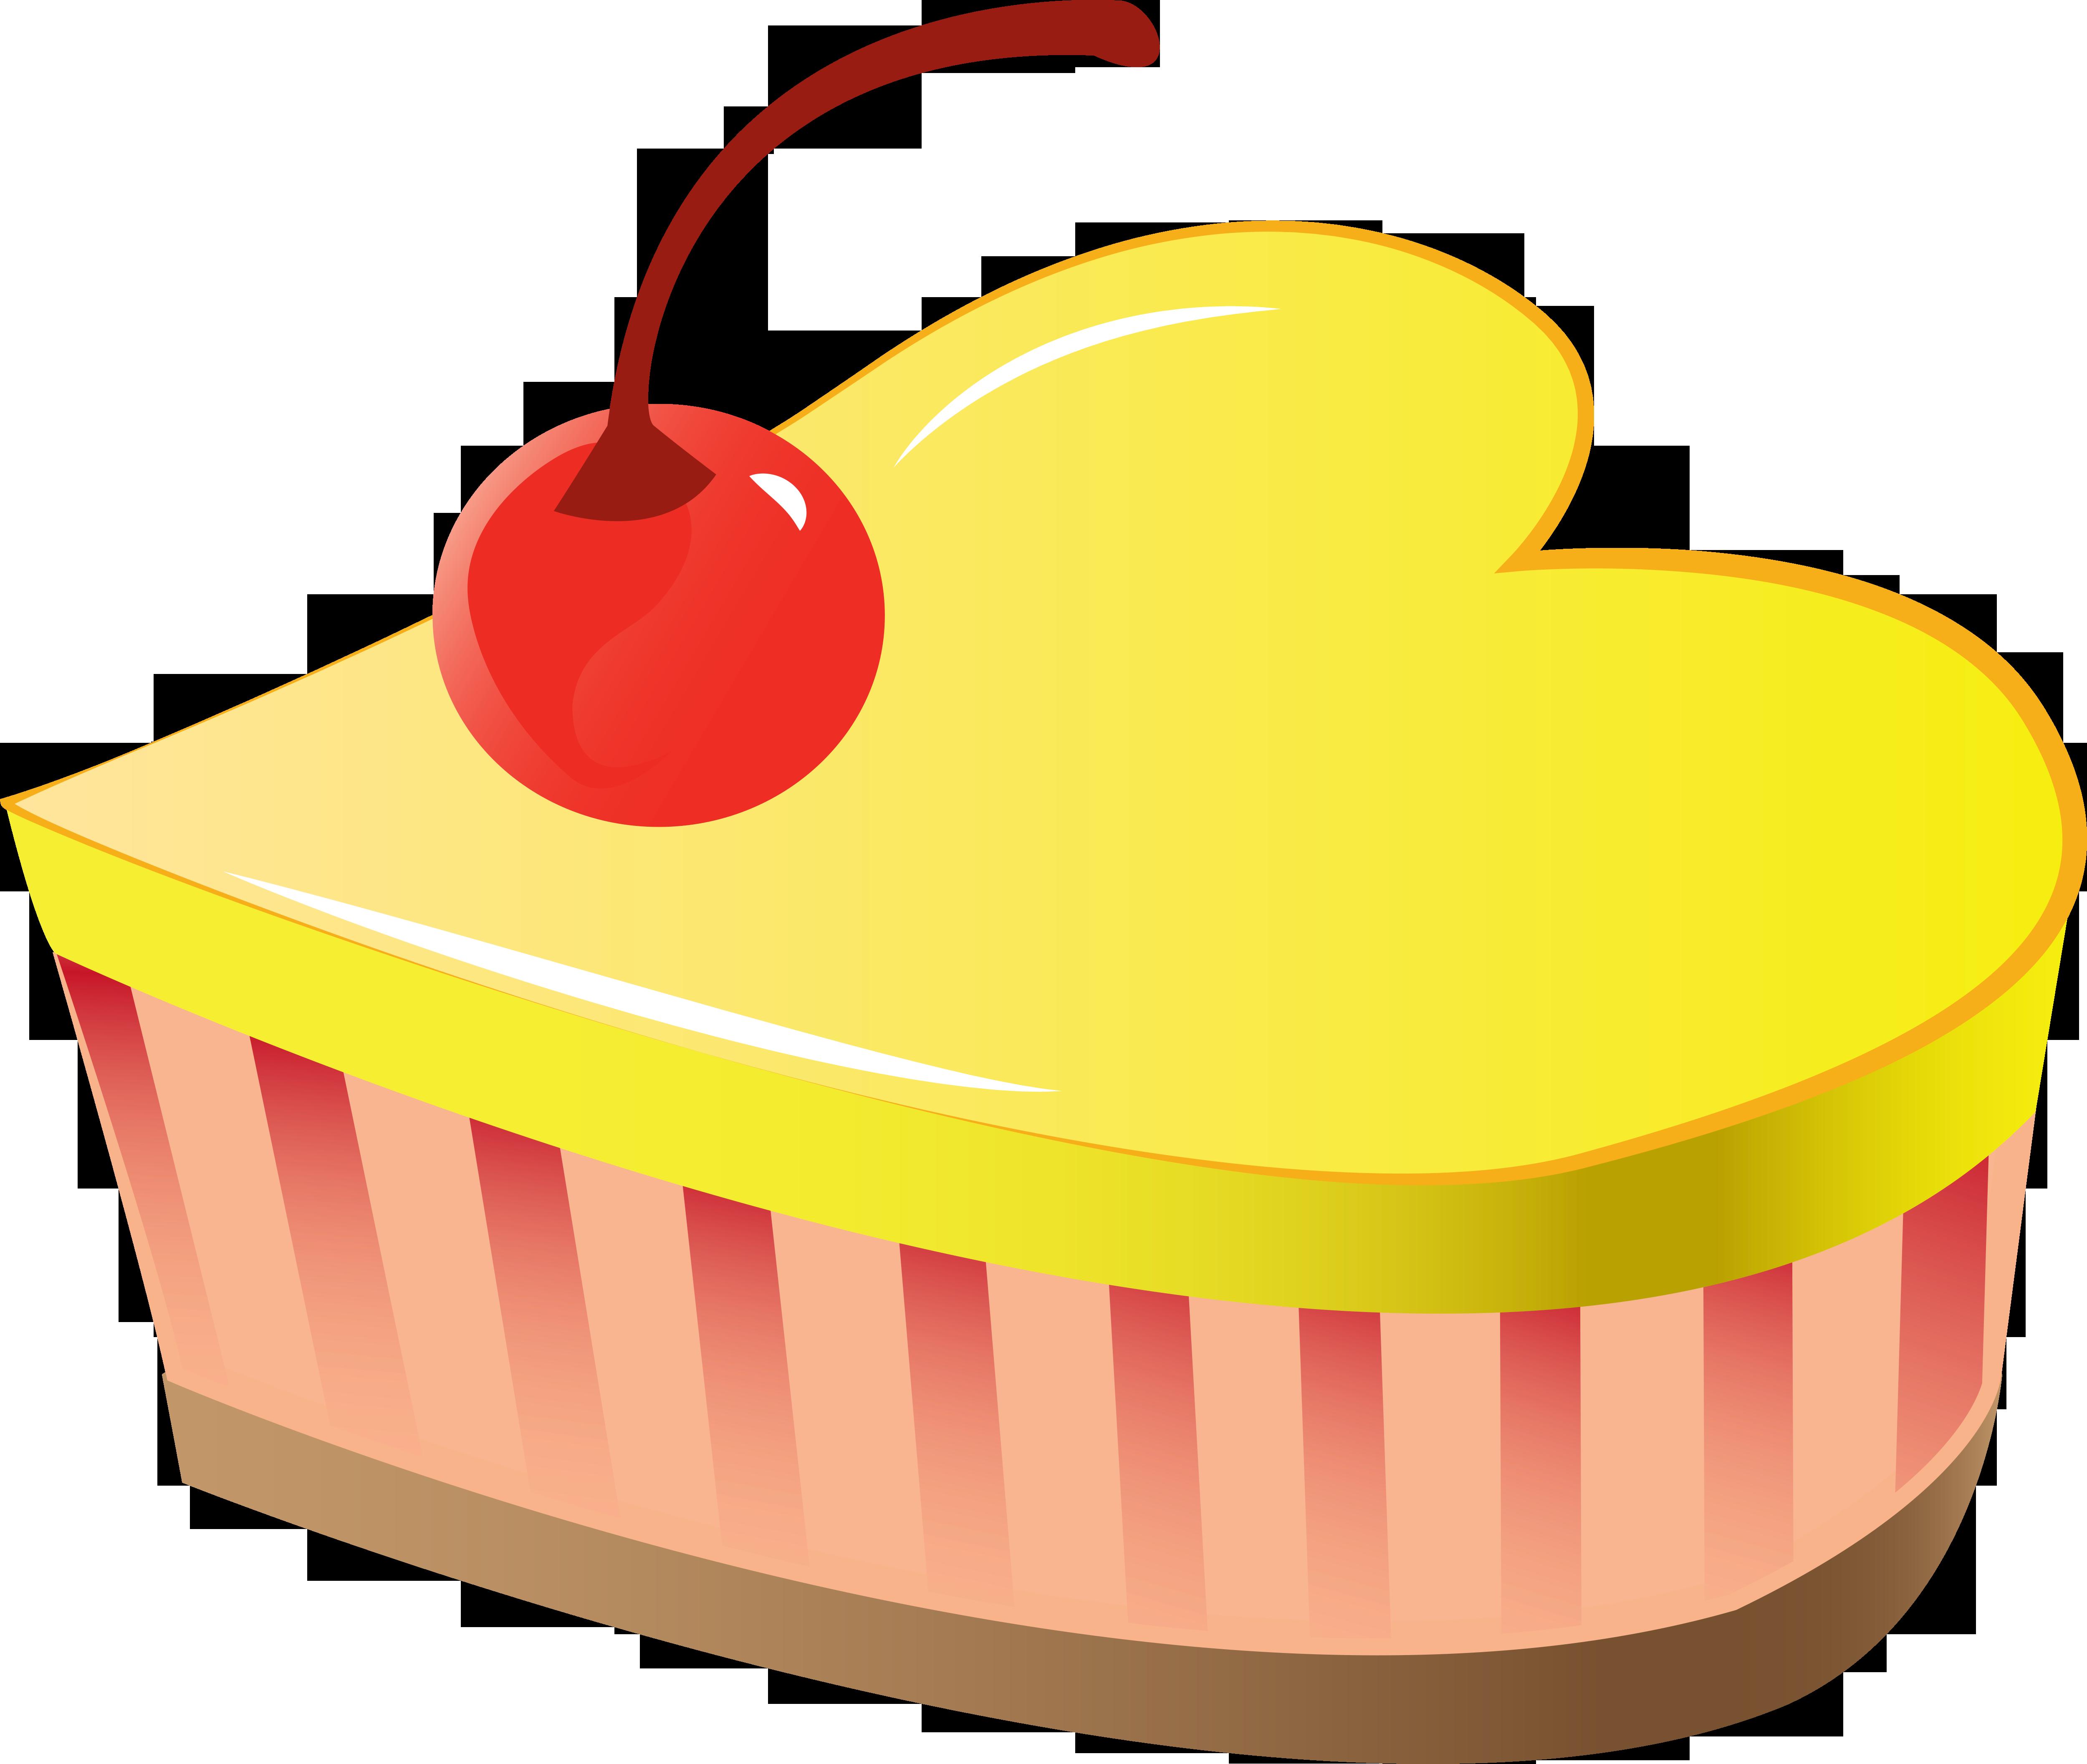 Cake Artist Logo : Cake logo Vector [ Commission ] by Sparxyz on DeviantArt